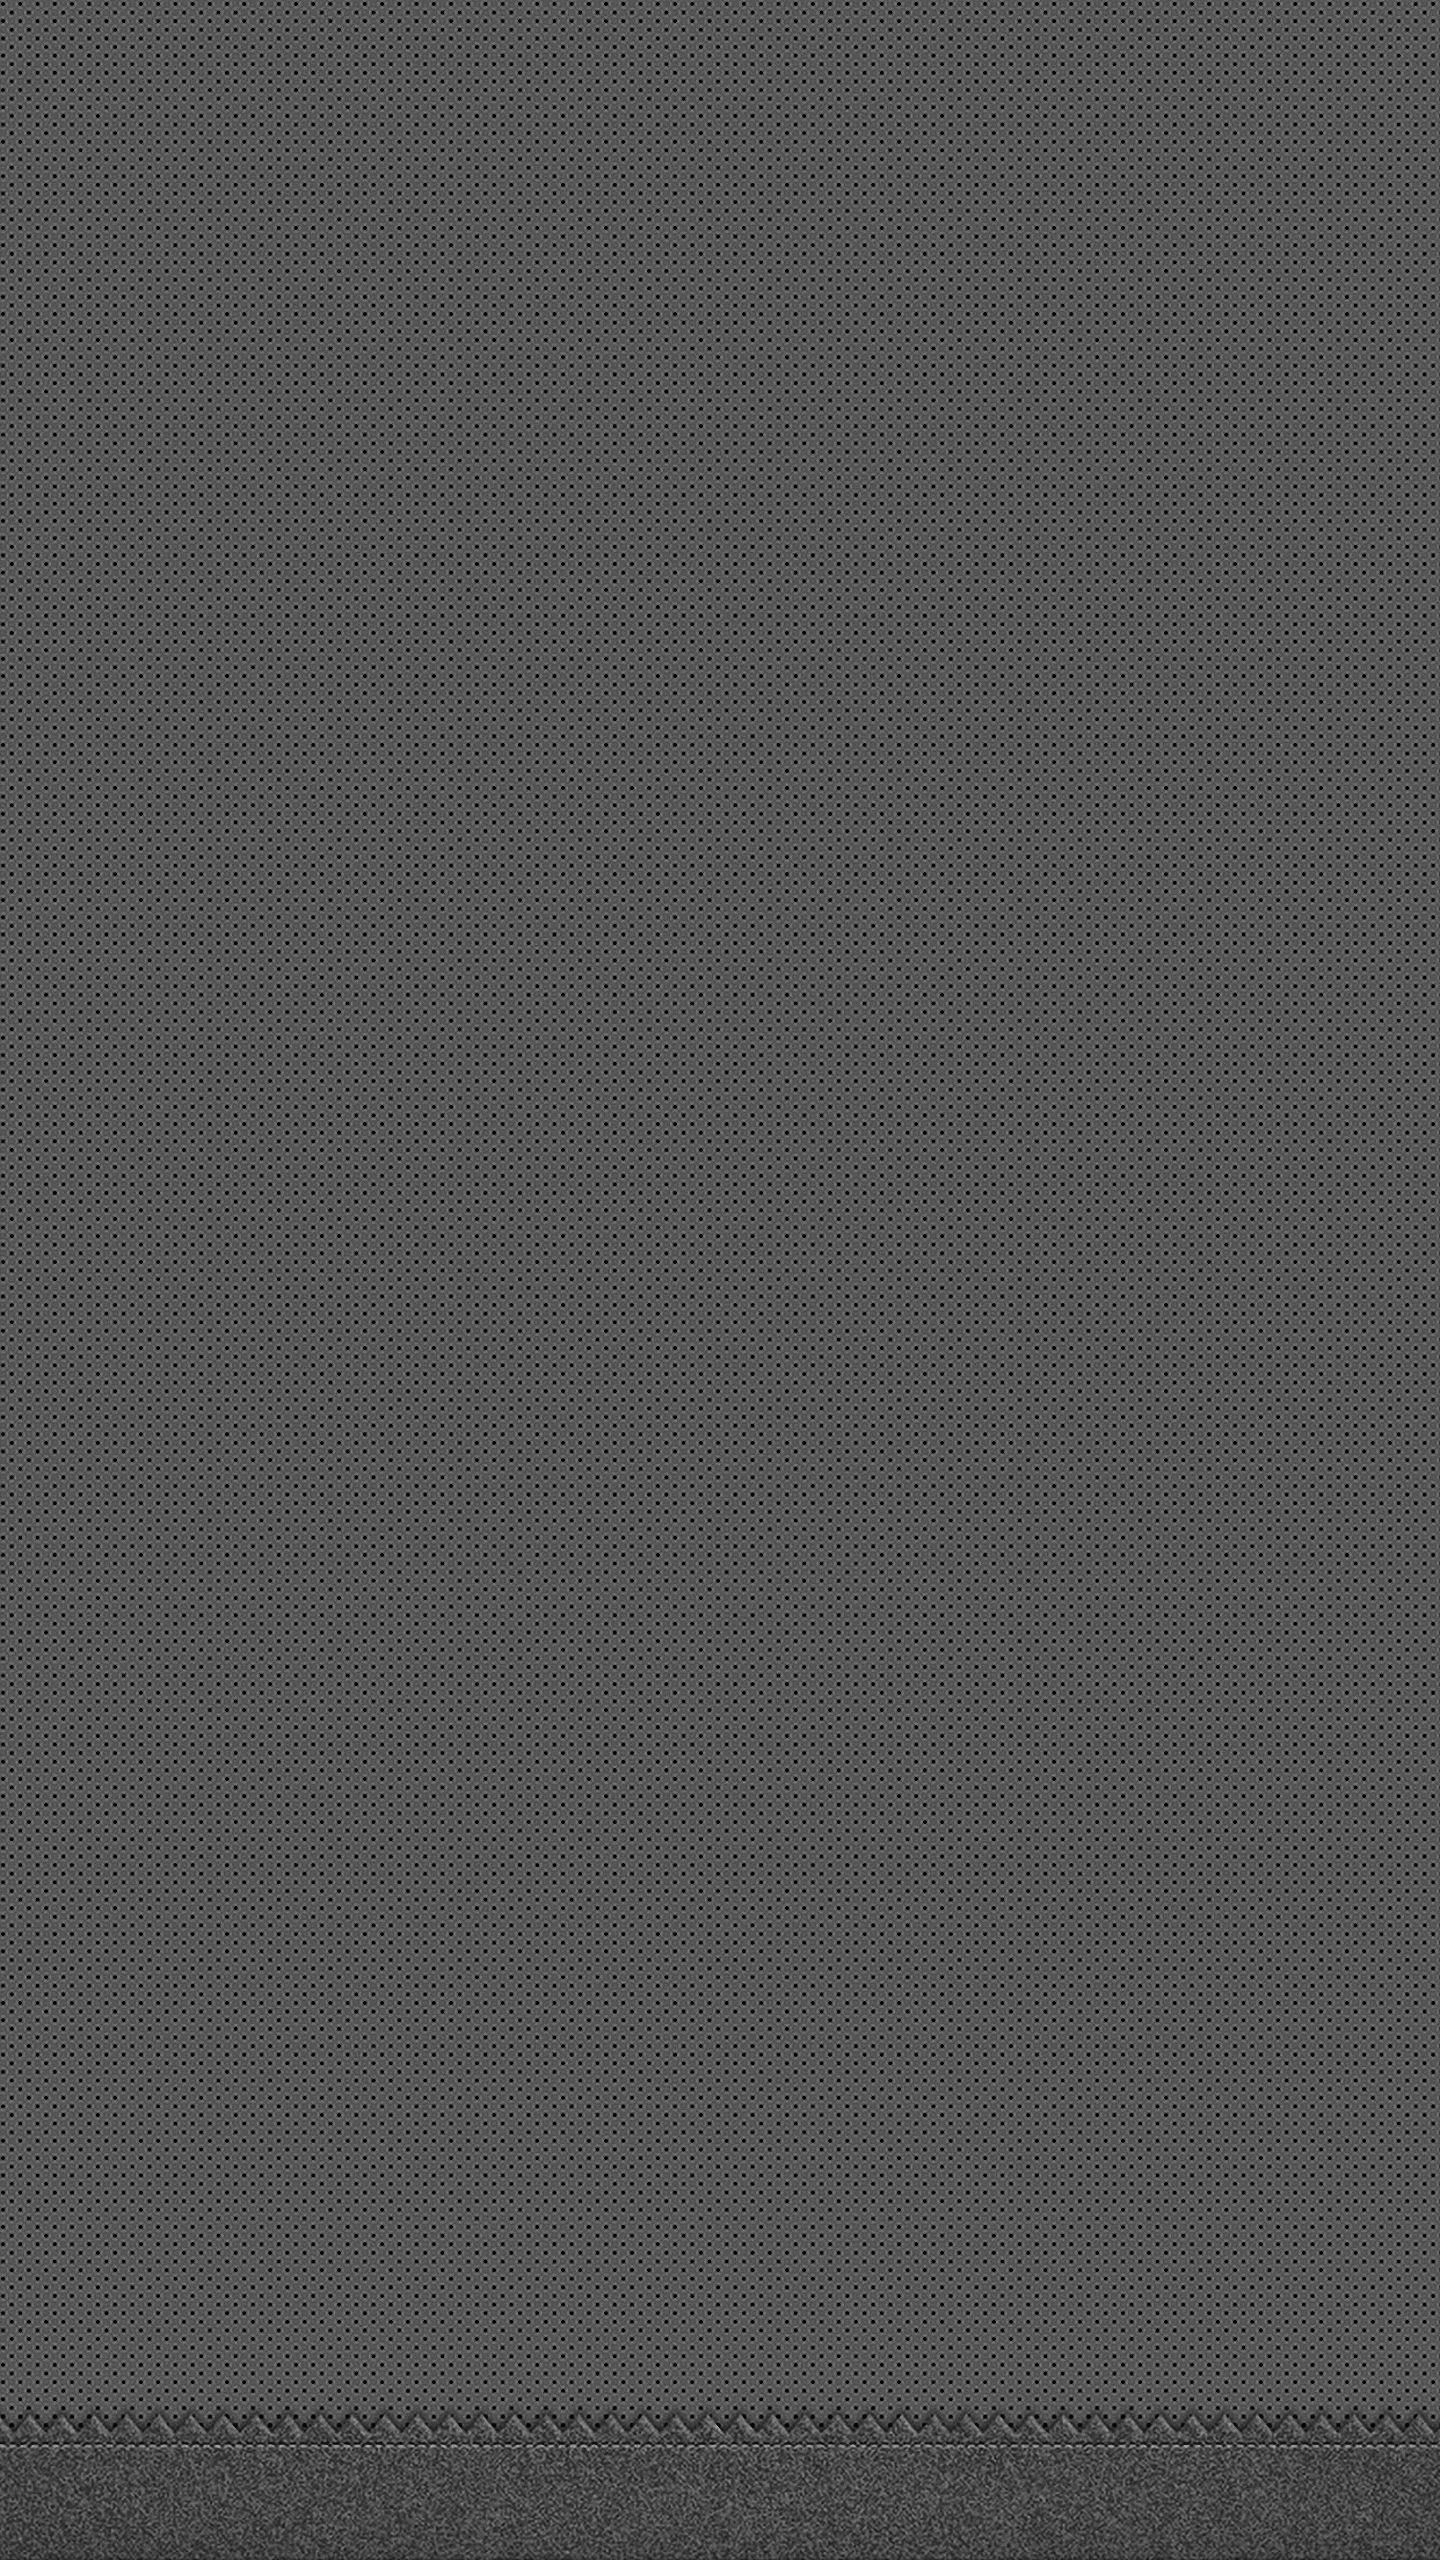 GreyAbstractWallpaper321440x2560